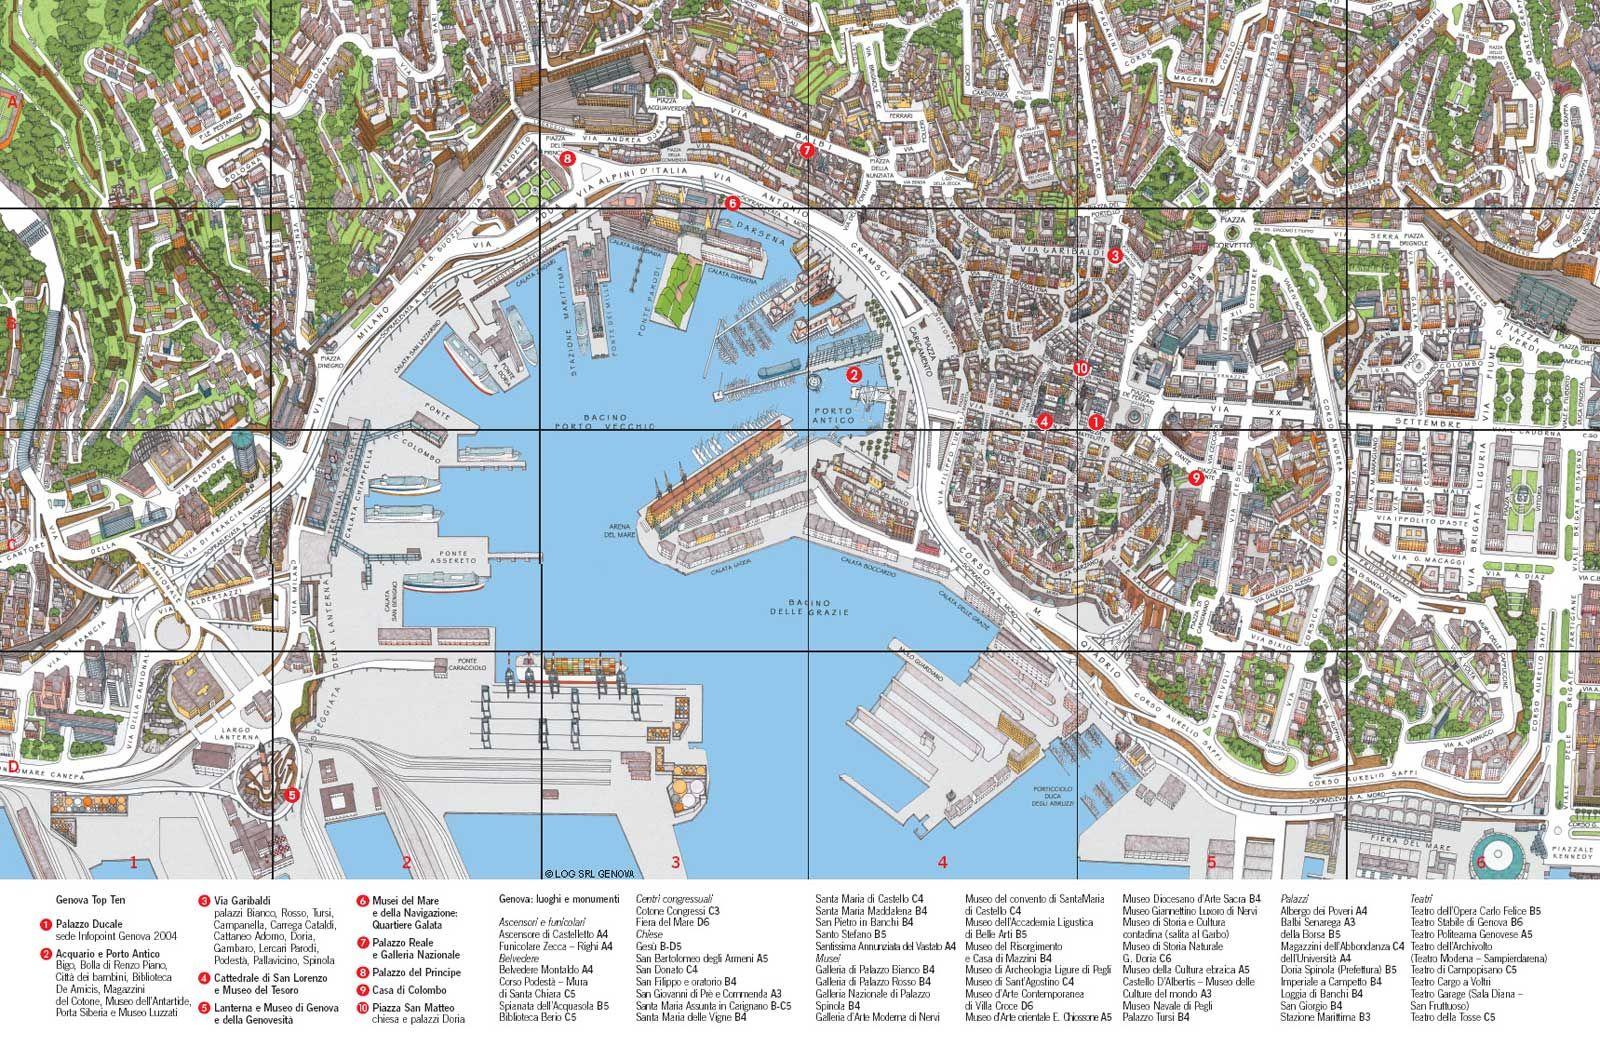 Genoa City Travel Map Mapsof Net Avec Images Carte